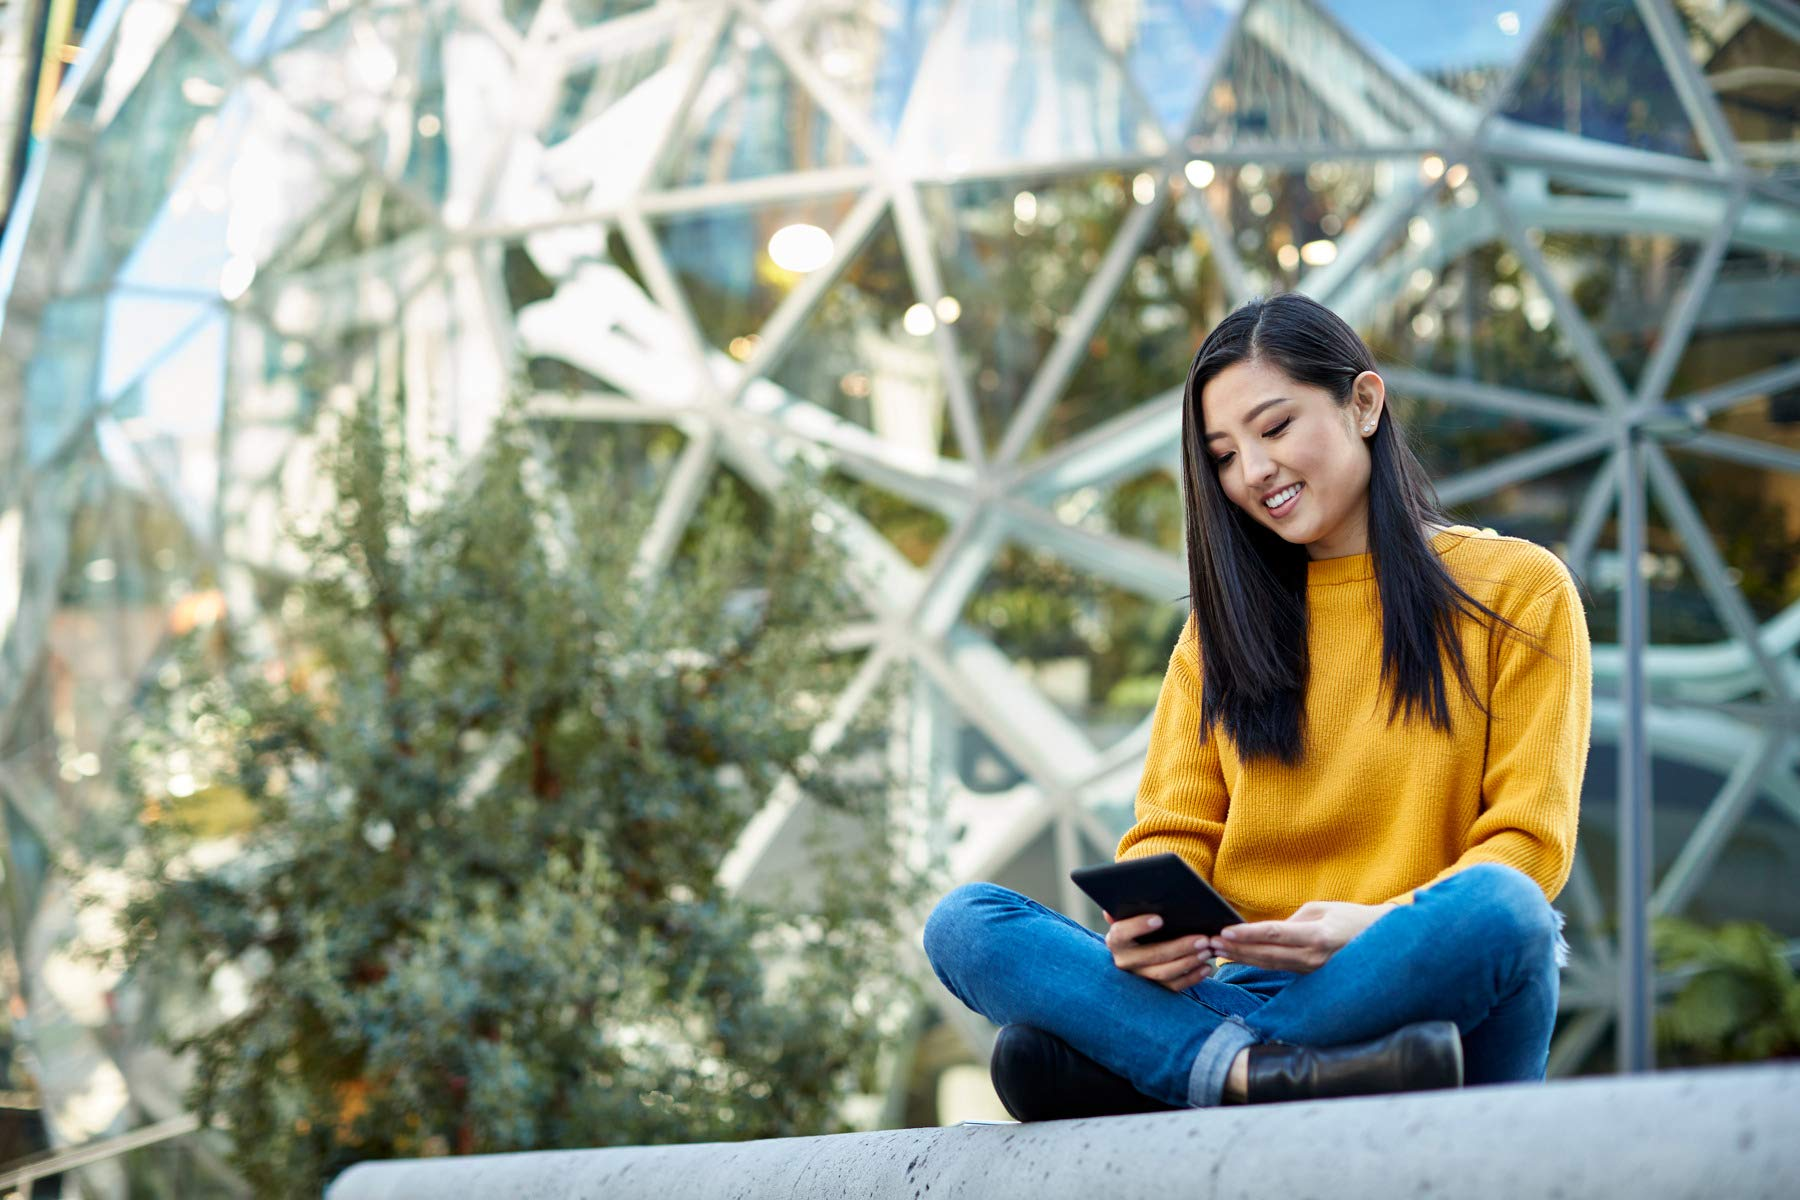 Amazon Spheres 옆에 앉아서 태블릿을 보고 있는 젊은 여성